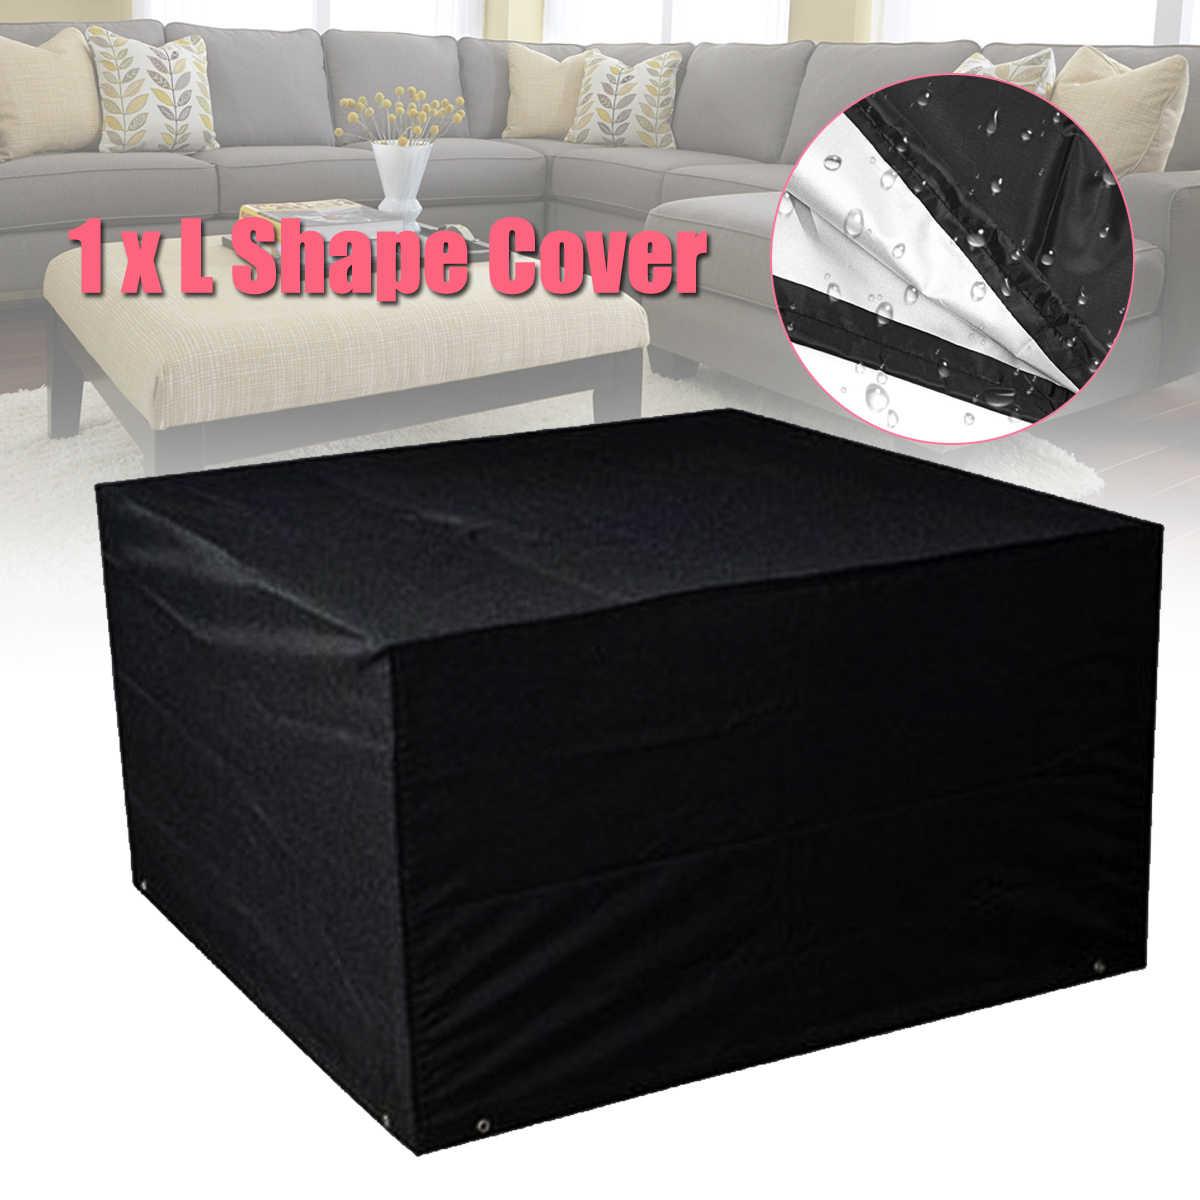 Waterproof Outdoor Patio Garden Furniture Cover Rain Snow Chair Wicker Sofa Table Dust Proof